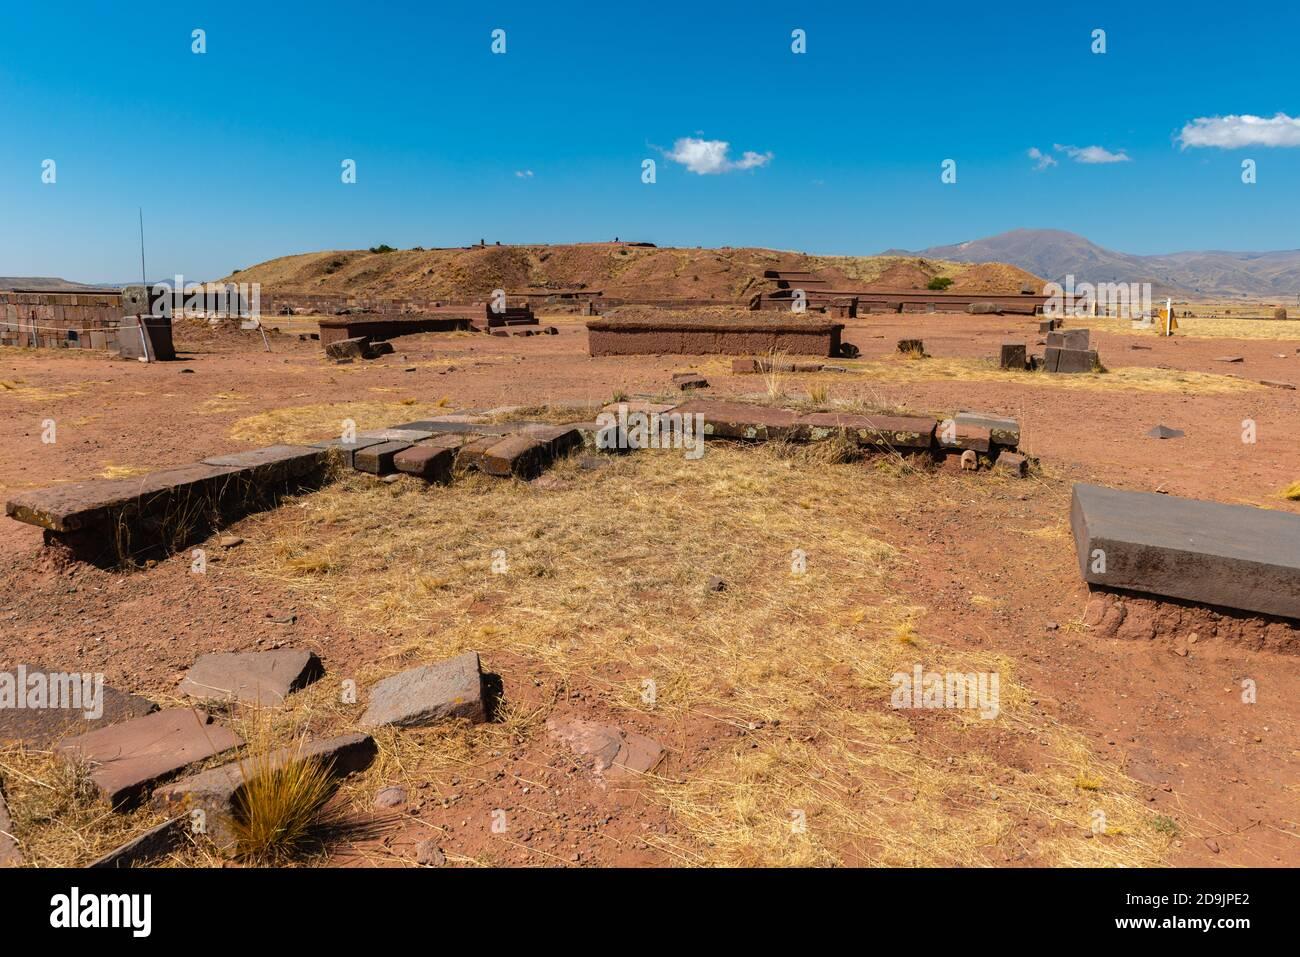 Cuartos cerimoniales Kalasasya, sito archeologico Tiwanaku o Tiahuanaco, patrimonio mondiale dell'UNESCO, Altiplano, la Paz, Bolivia, America Latina Foto Stock